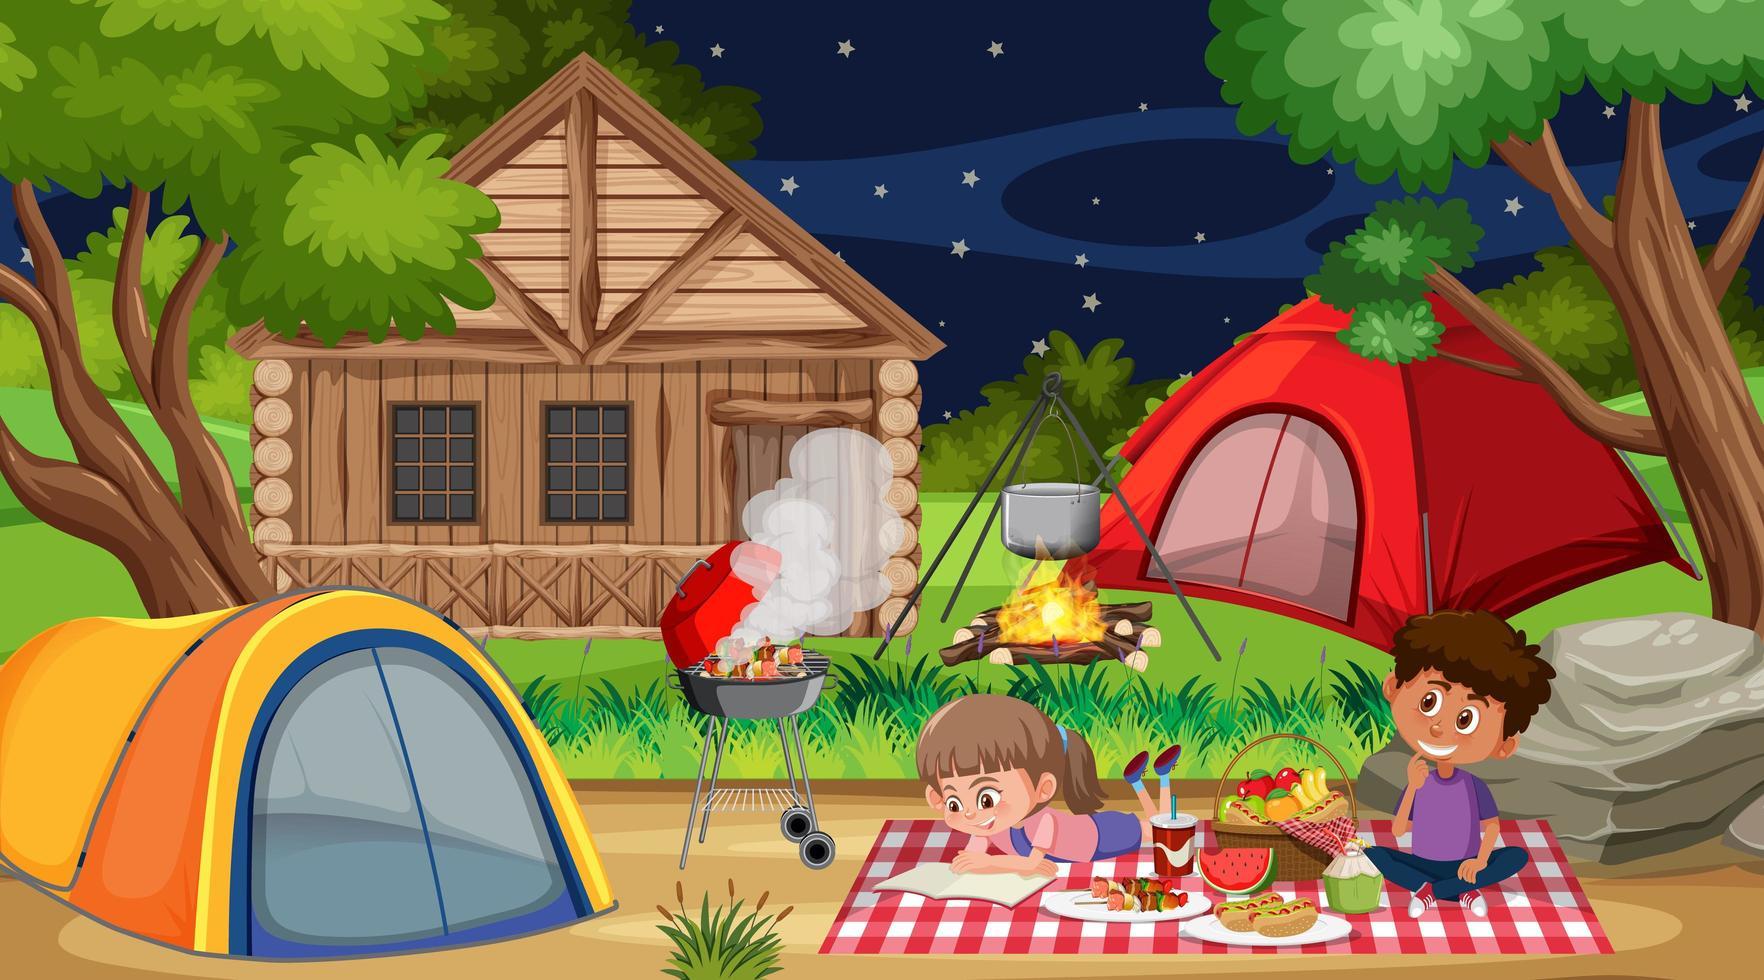 Picknickszene mit Familie im Wald vektor